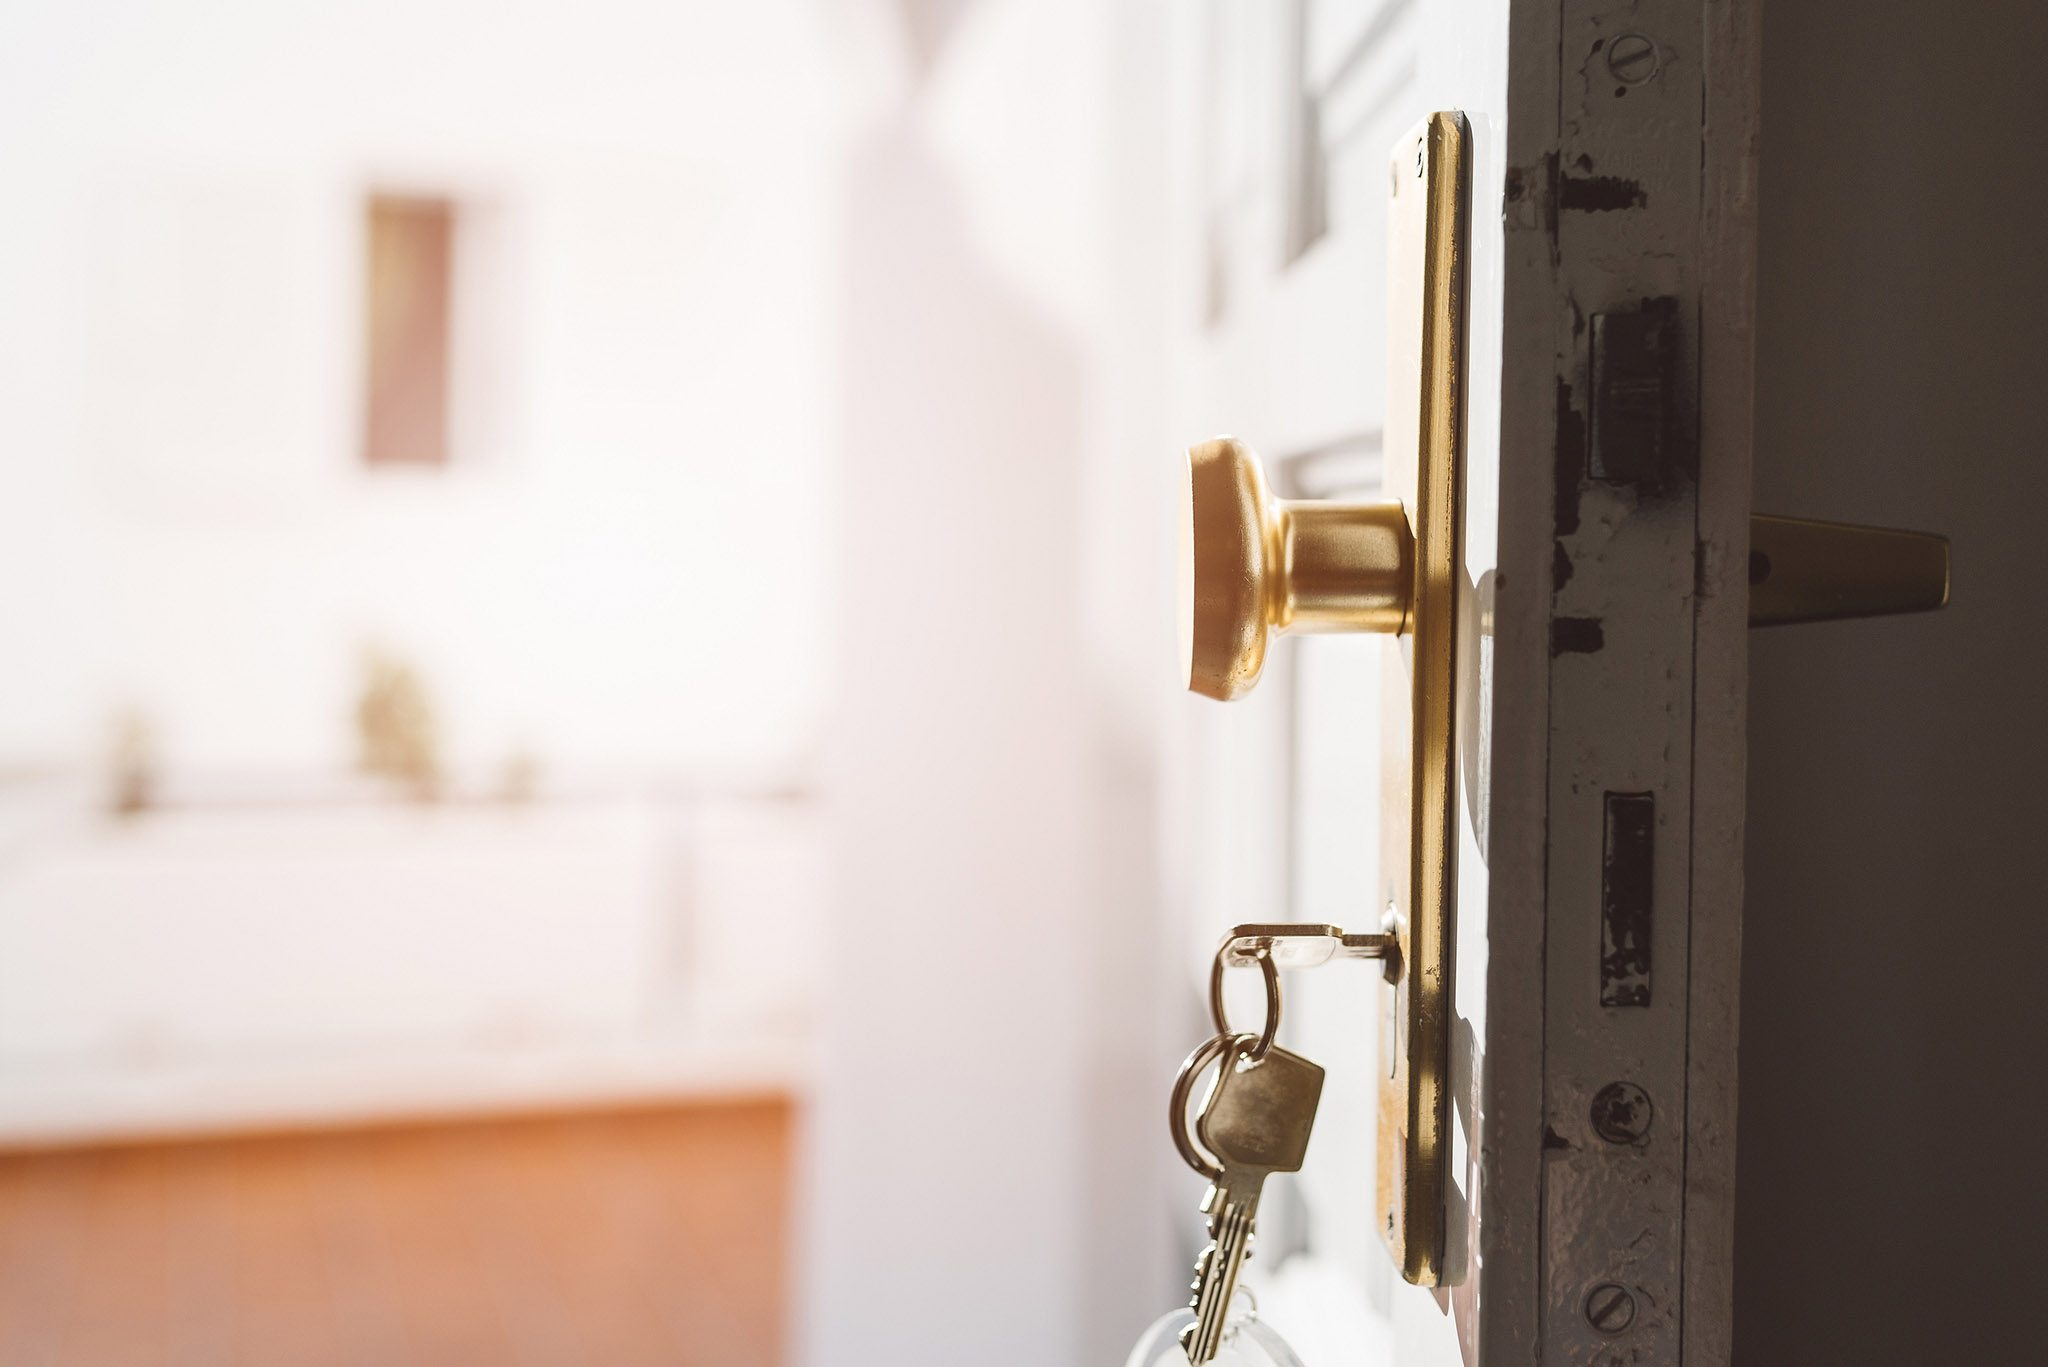 Residential Re-Key & Open Ups